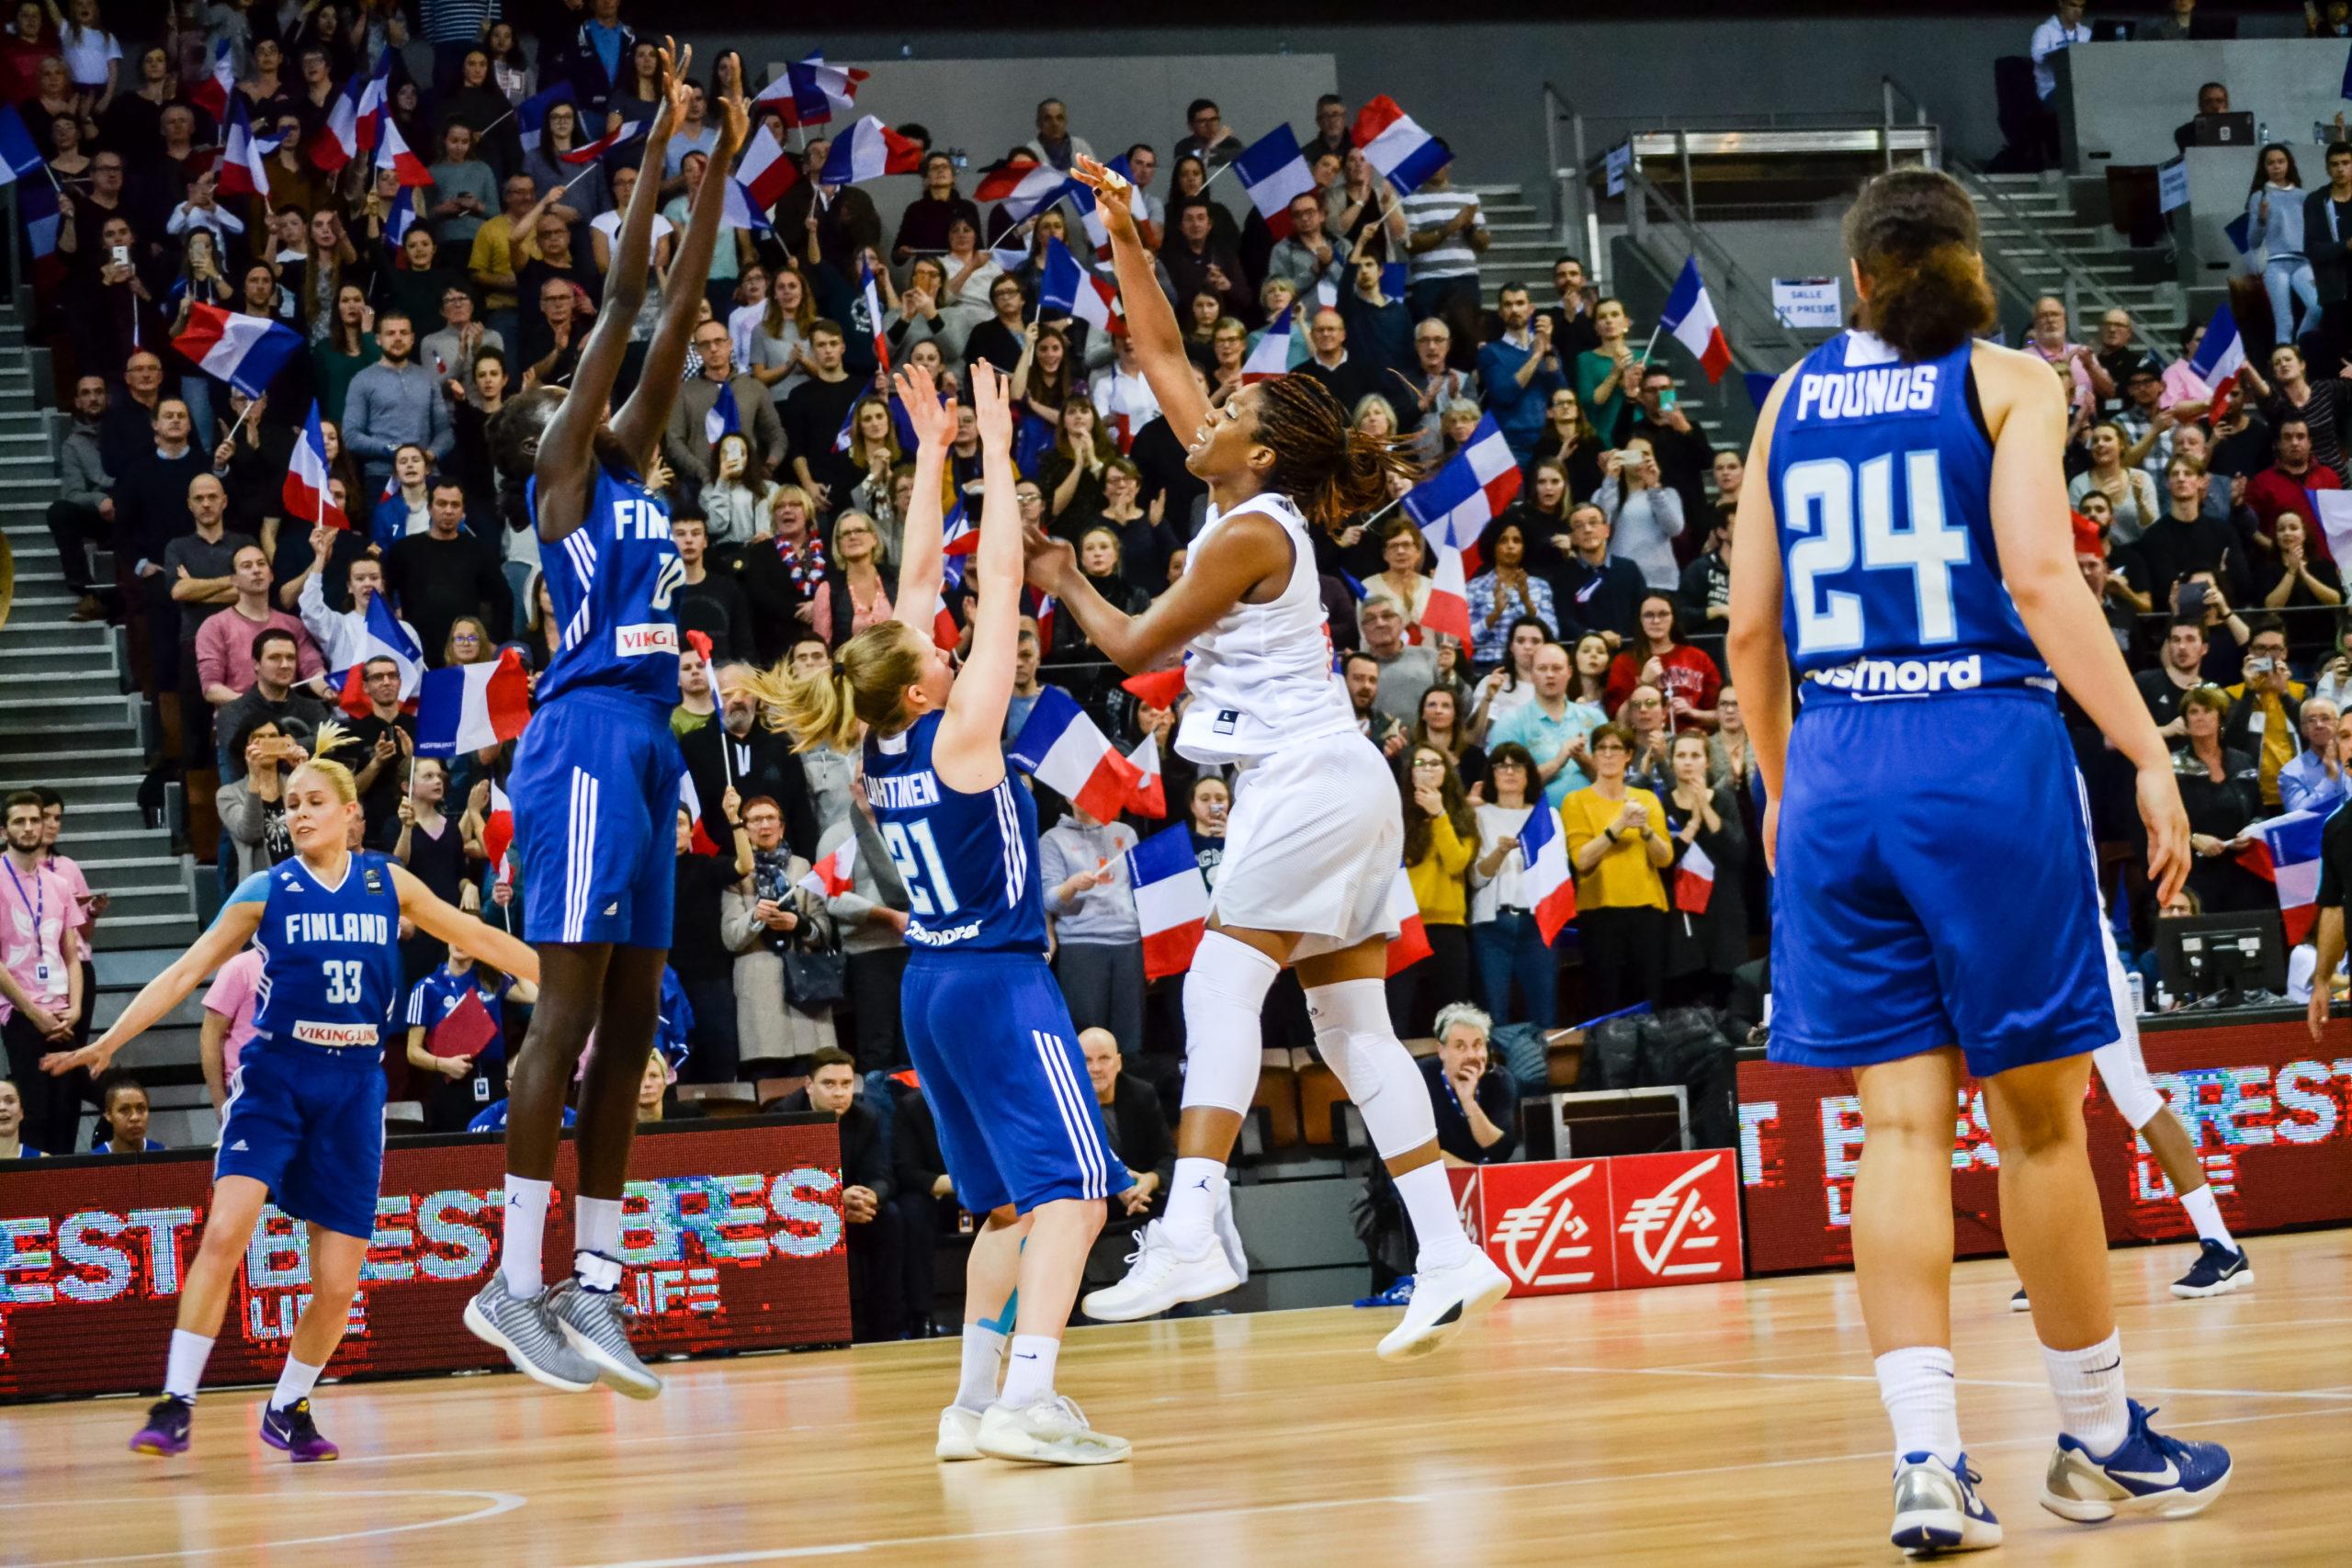 TQO 2019 - Match France Finlande. Crédits : WikiCommons